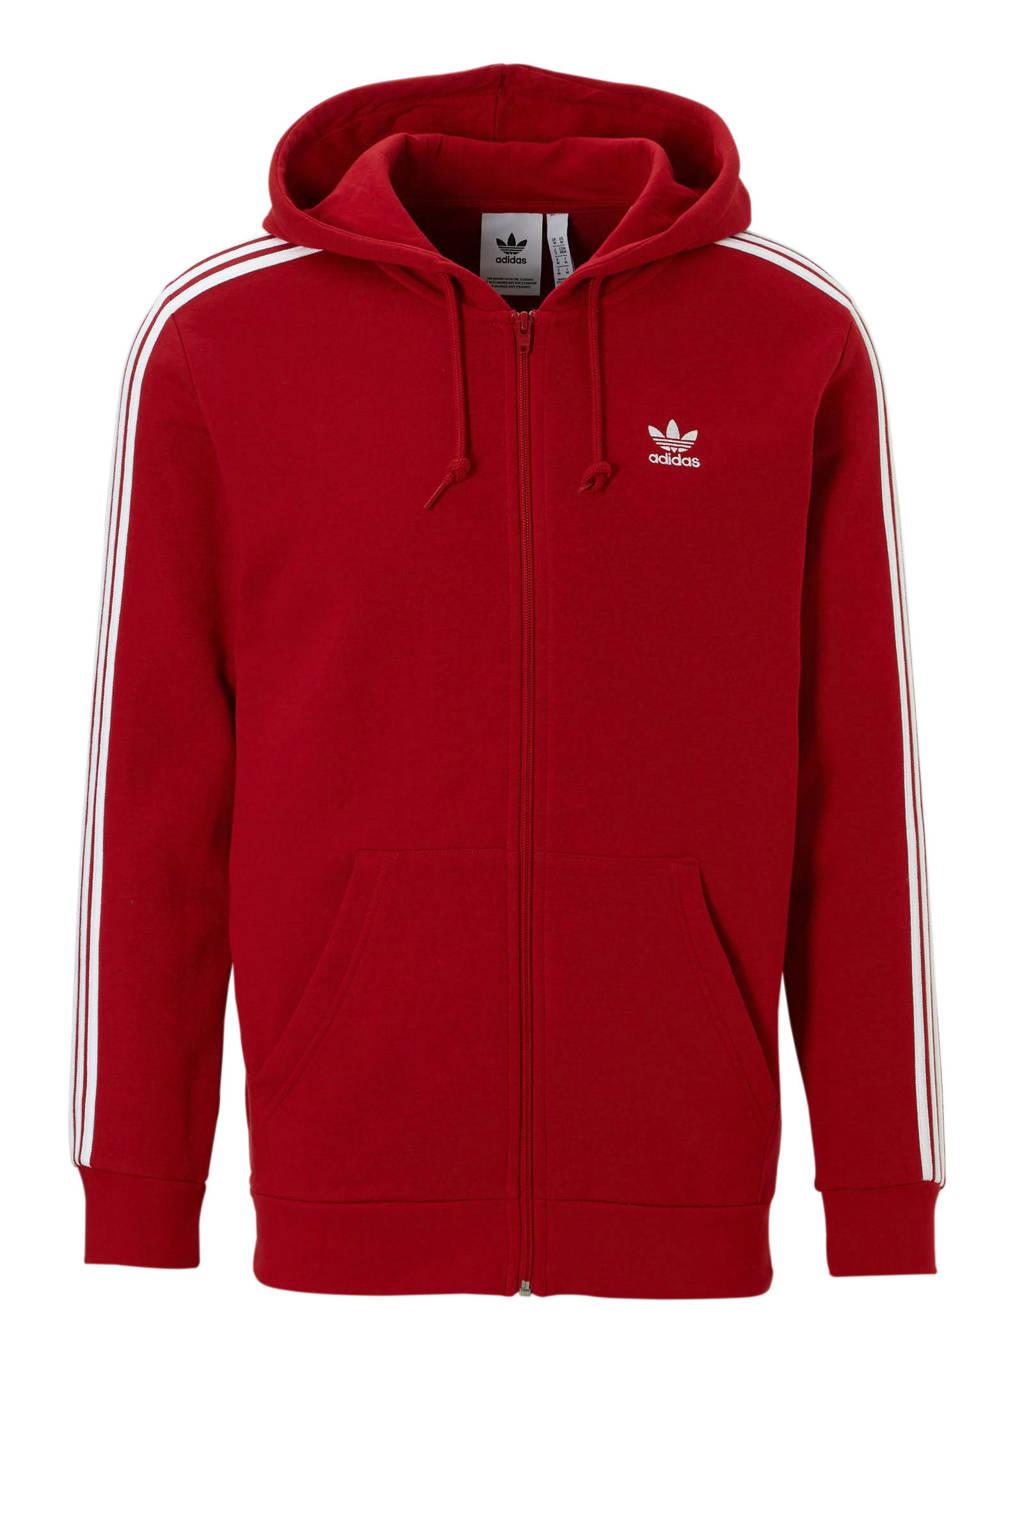 bdfec2b4419 adidas originals vest rood, Rood/wit